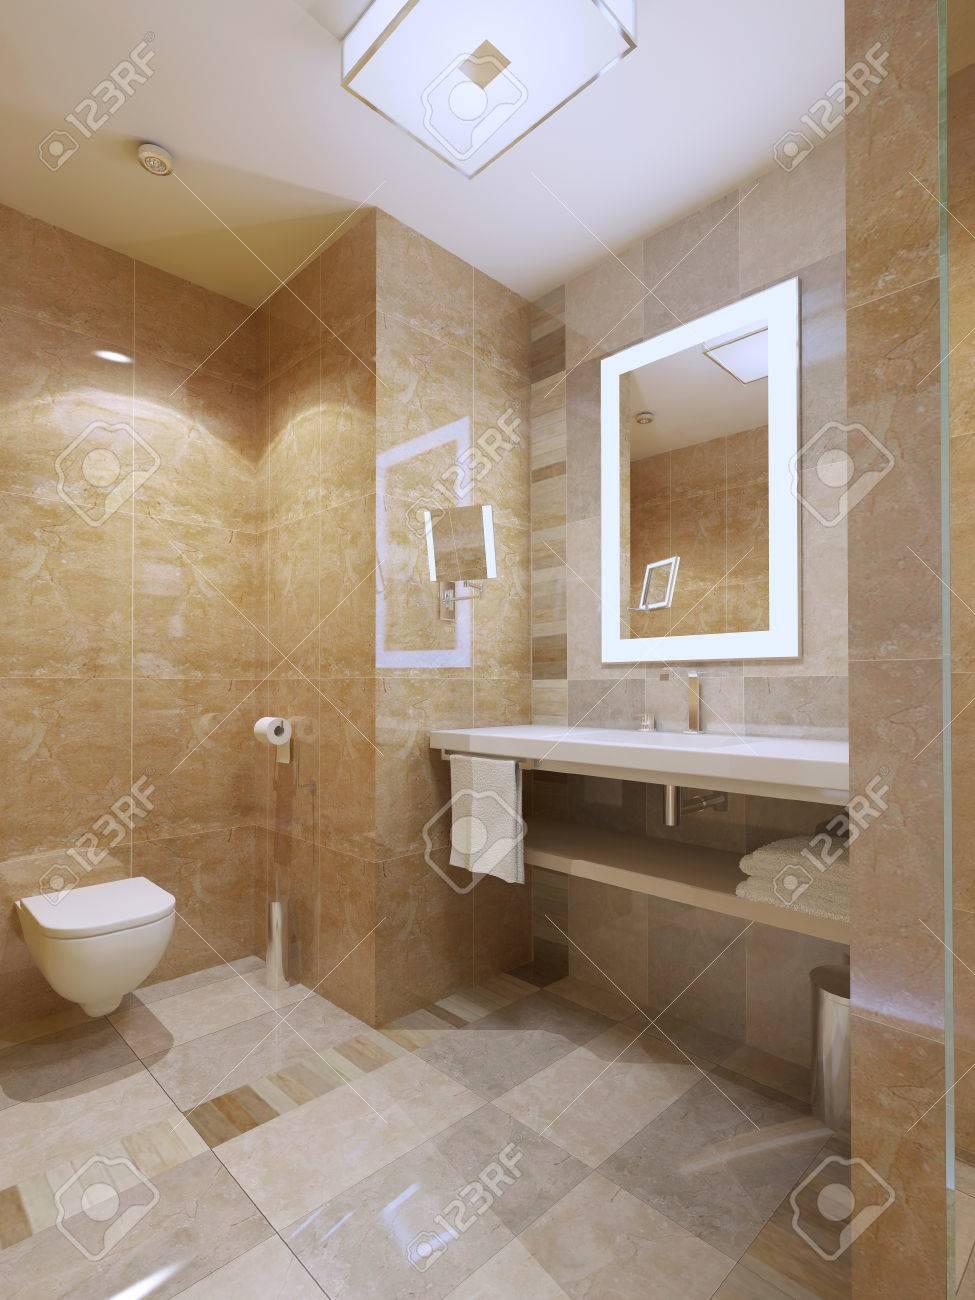 Salle De Bain Dans Chambre ~ salle de bain style moderne chambre lumineuse avec carrelage en